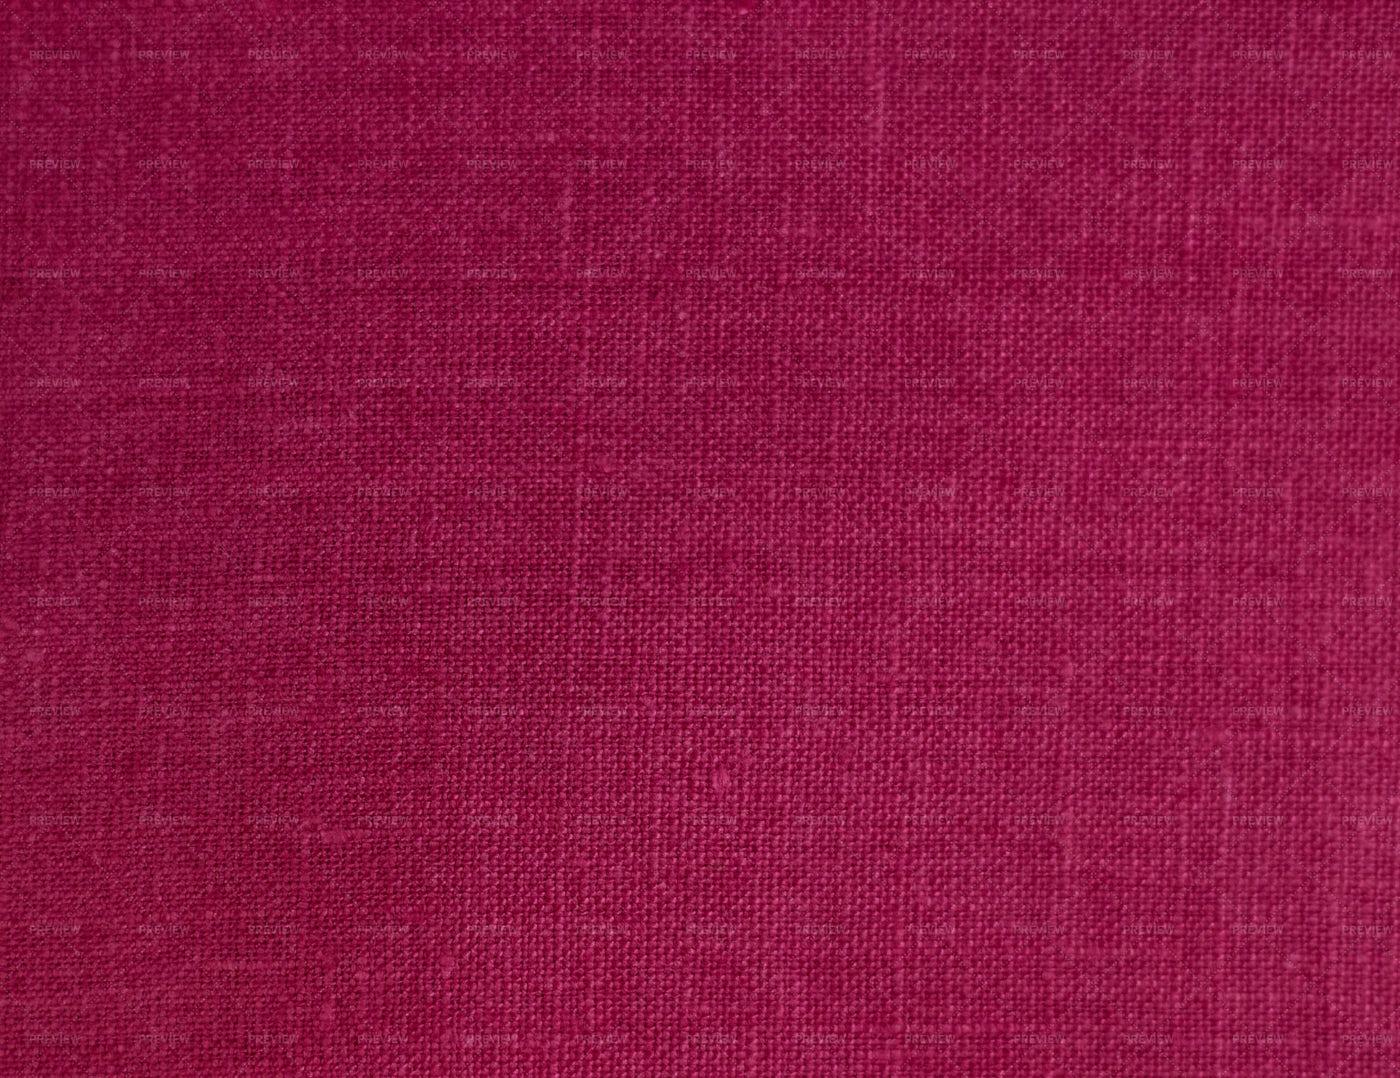 Red Pink Linen Texture: Stock Photos